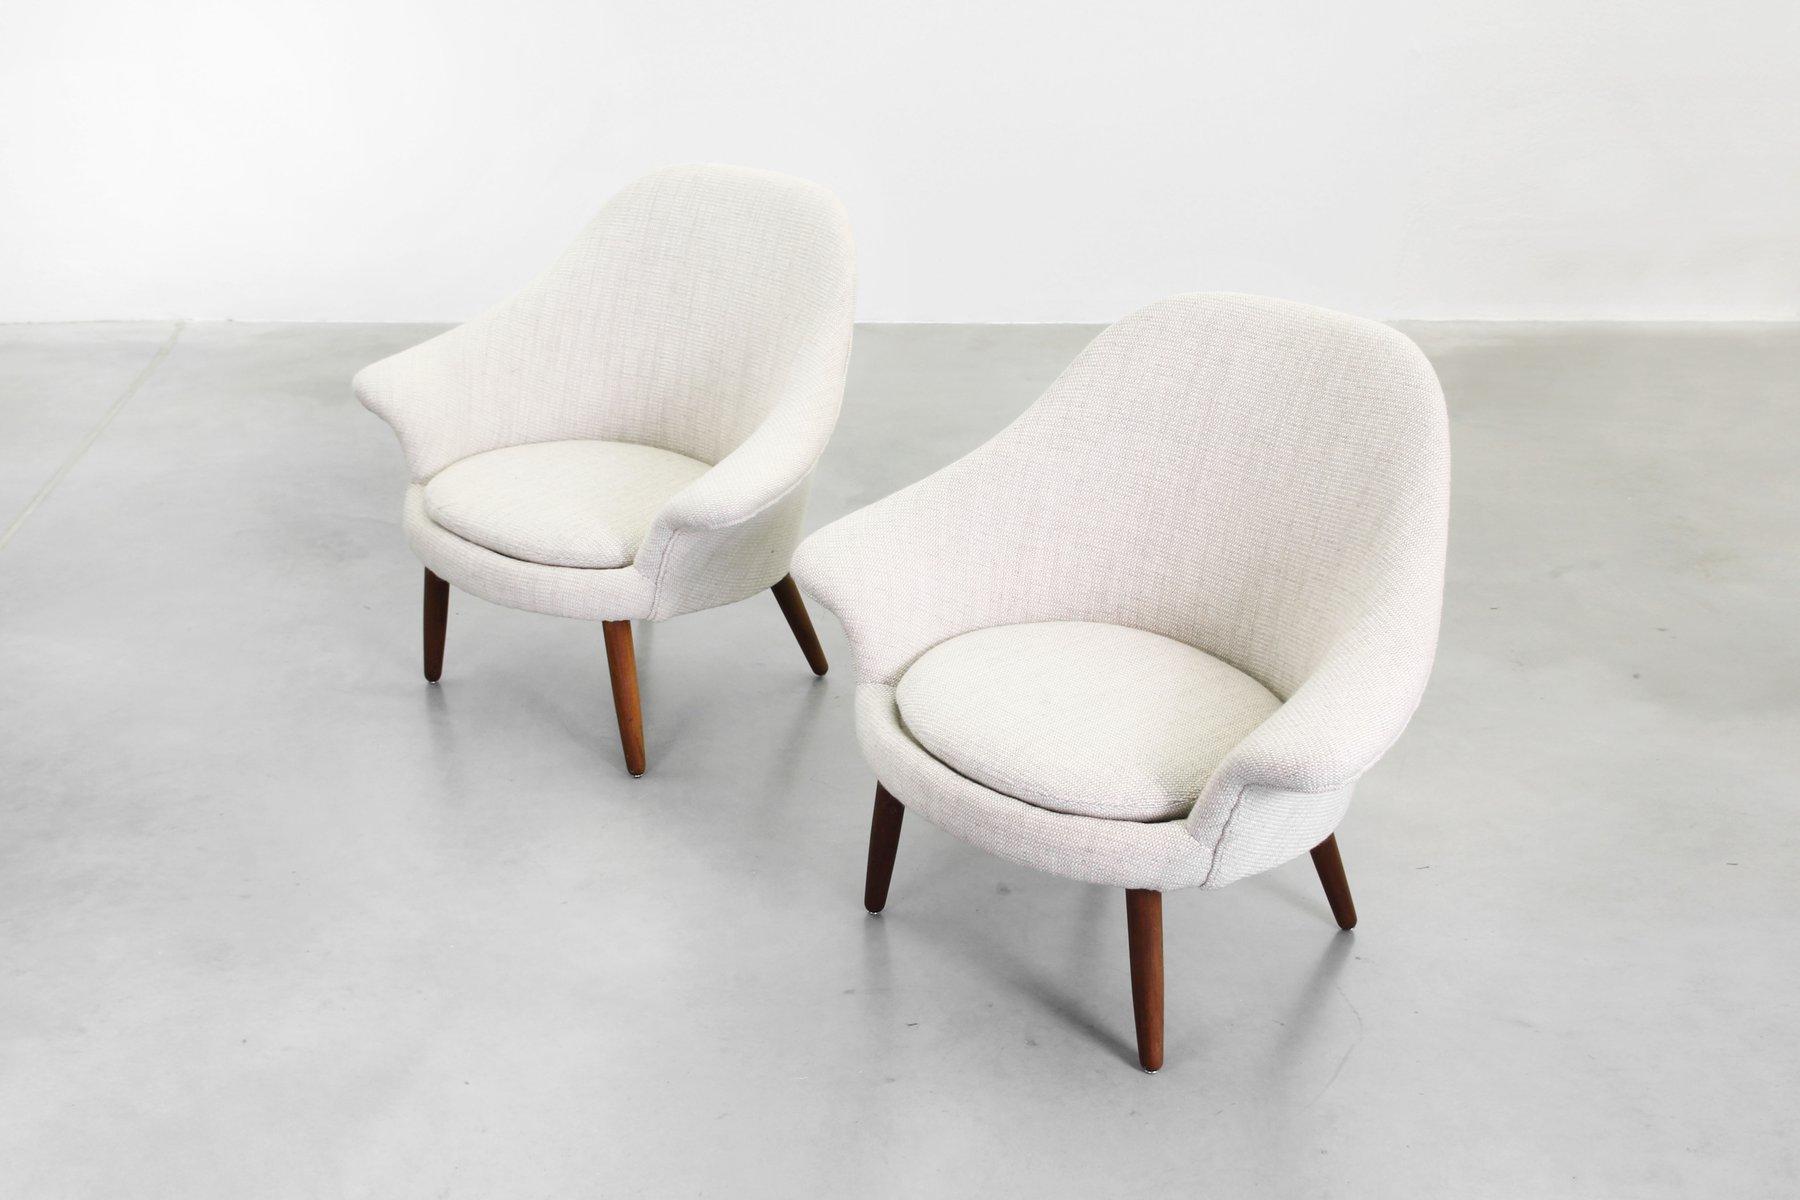 d nische sessel 1950 2er set bei pamono kaufen. Black Bedroom Furniture Sets. Home Design Ideas